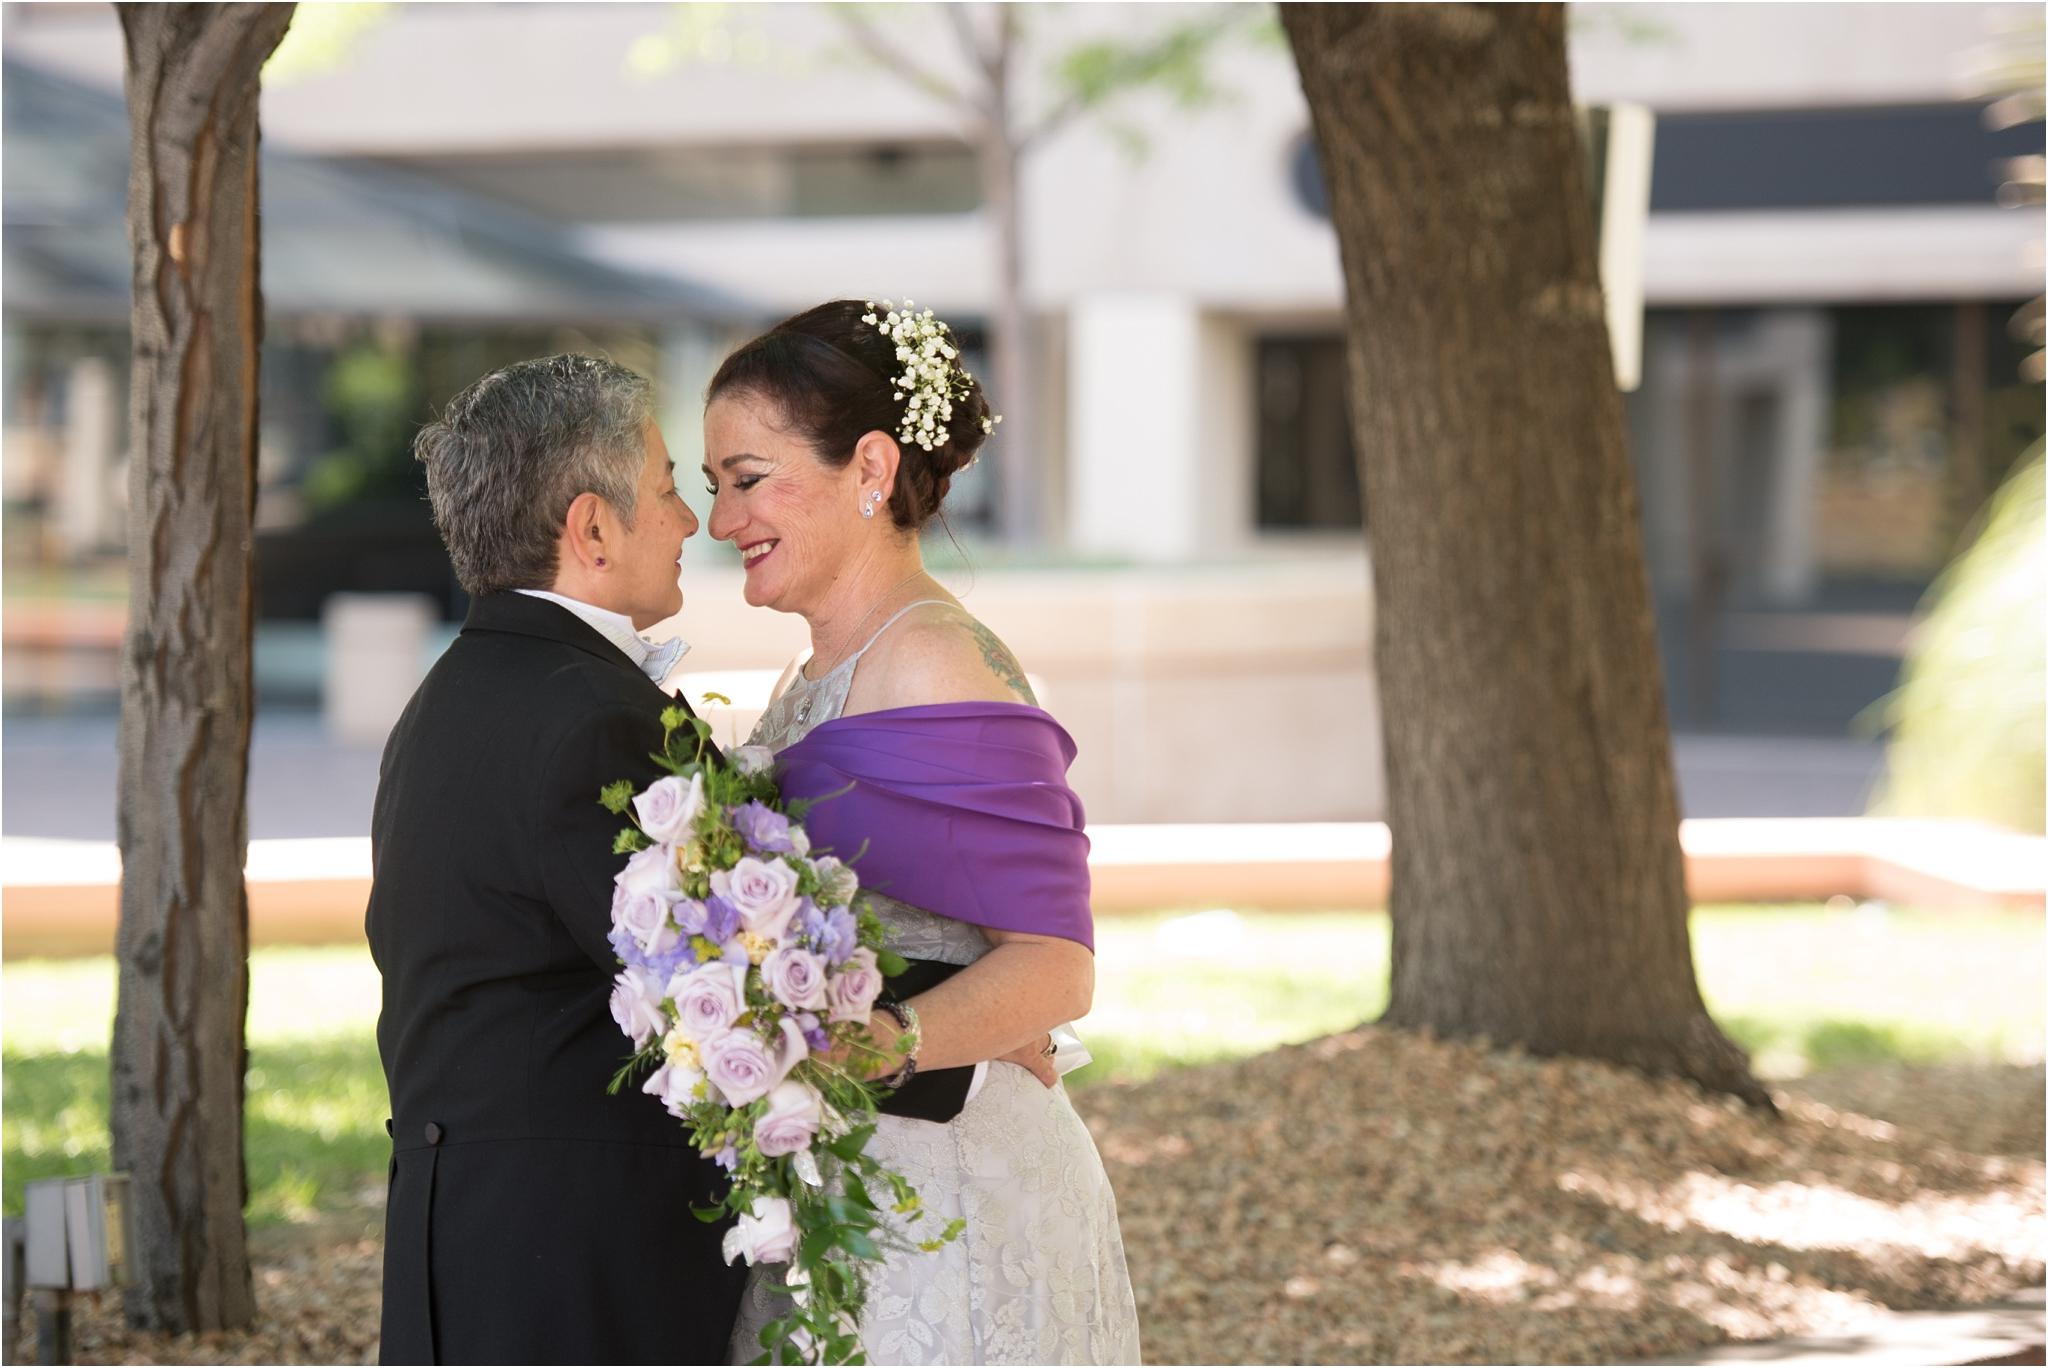 kayla kitts photography - albuquerque wedding photographer - hotel andaluz wedding_0019.jpg